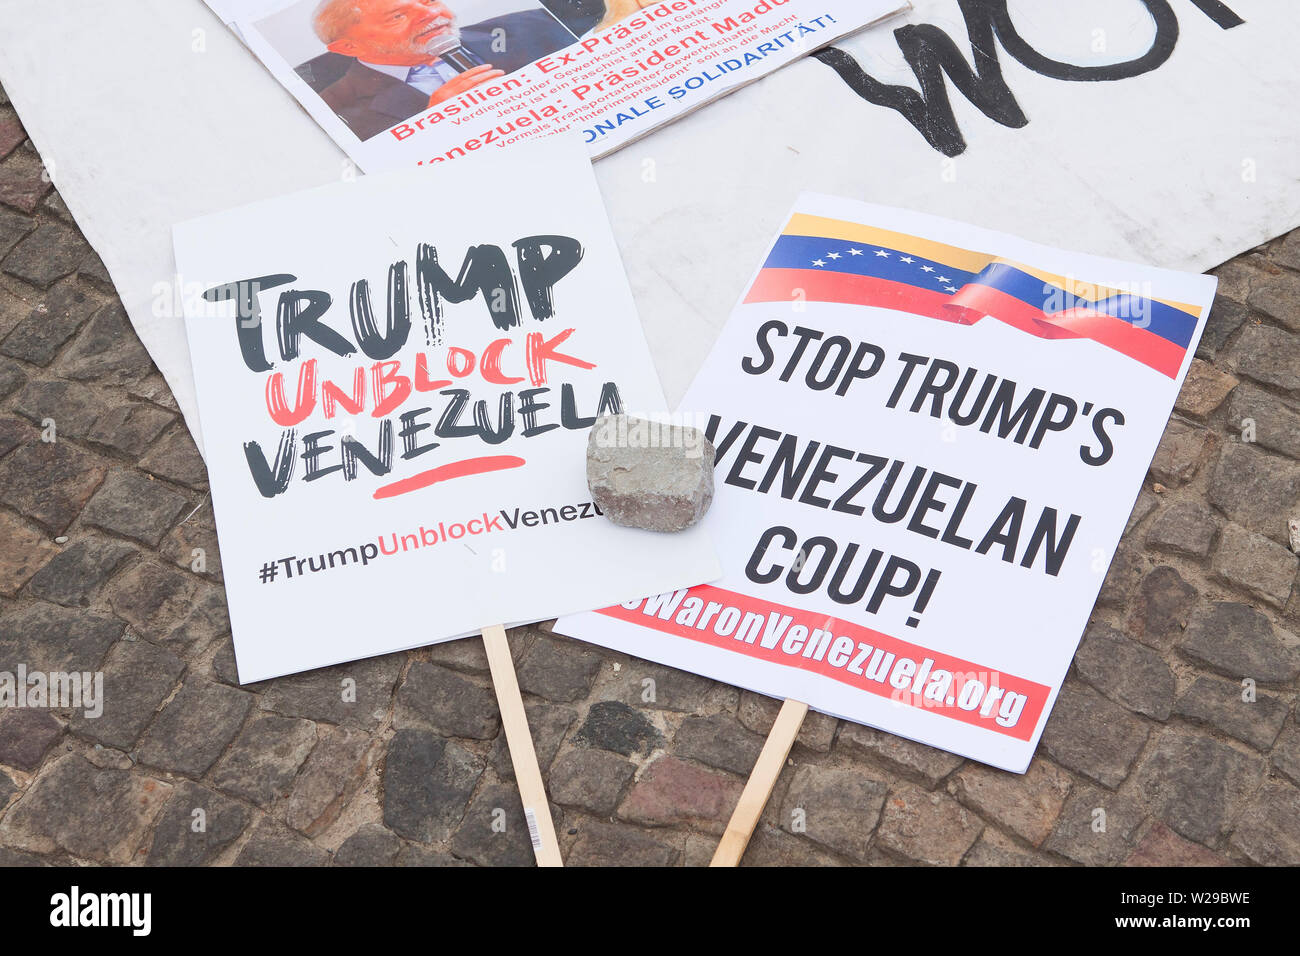 Protest against Trump - Stock Image